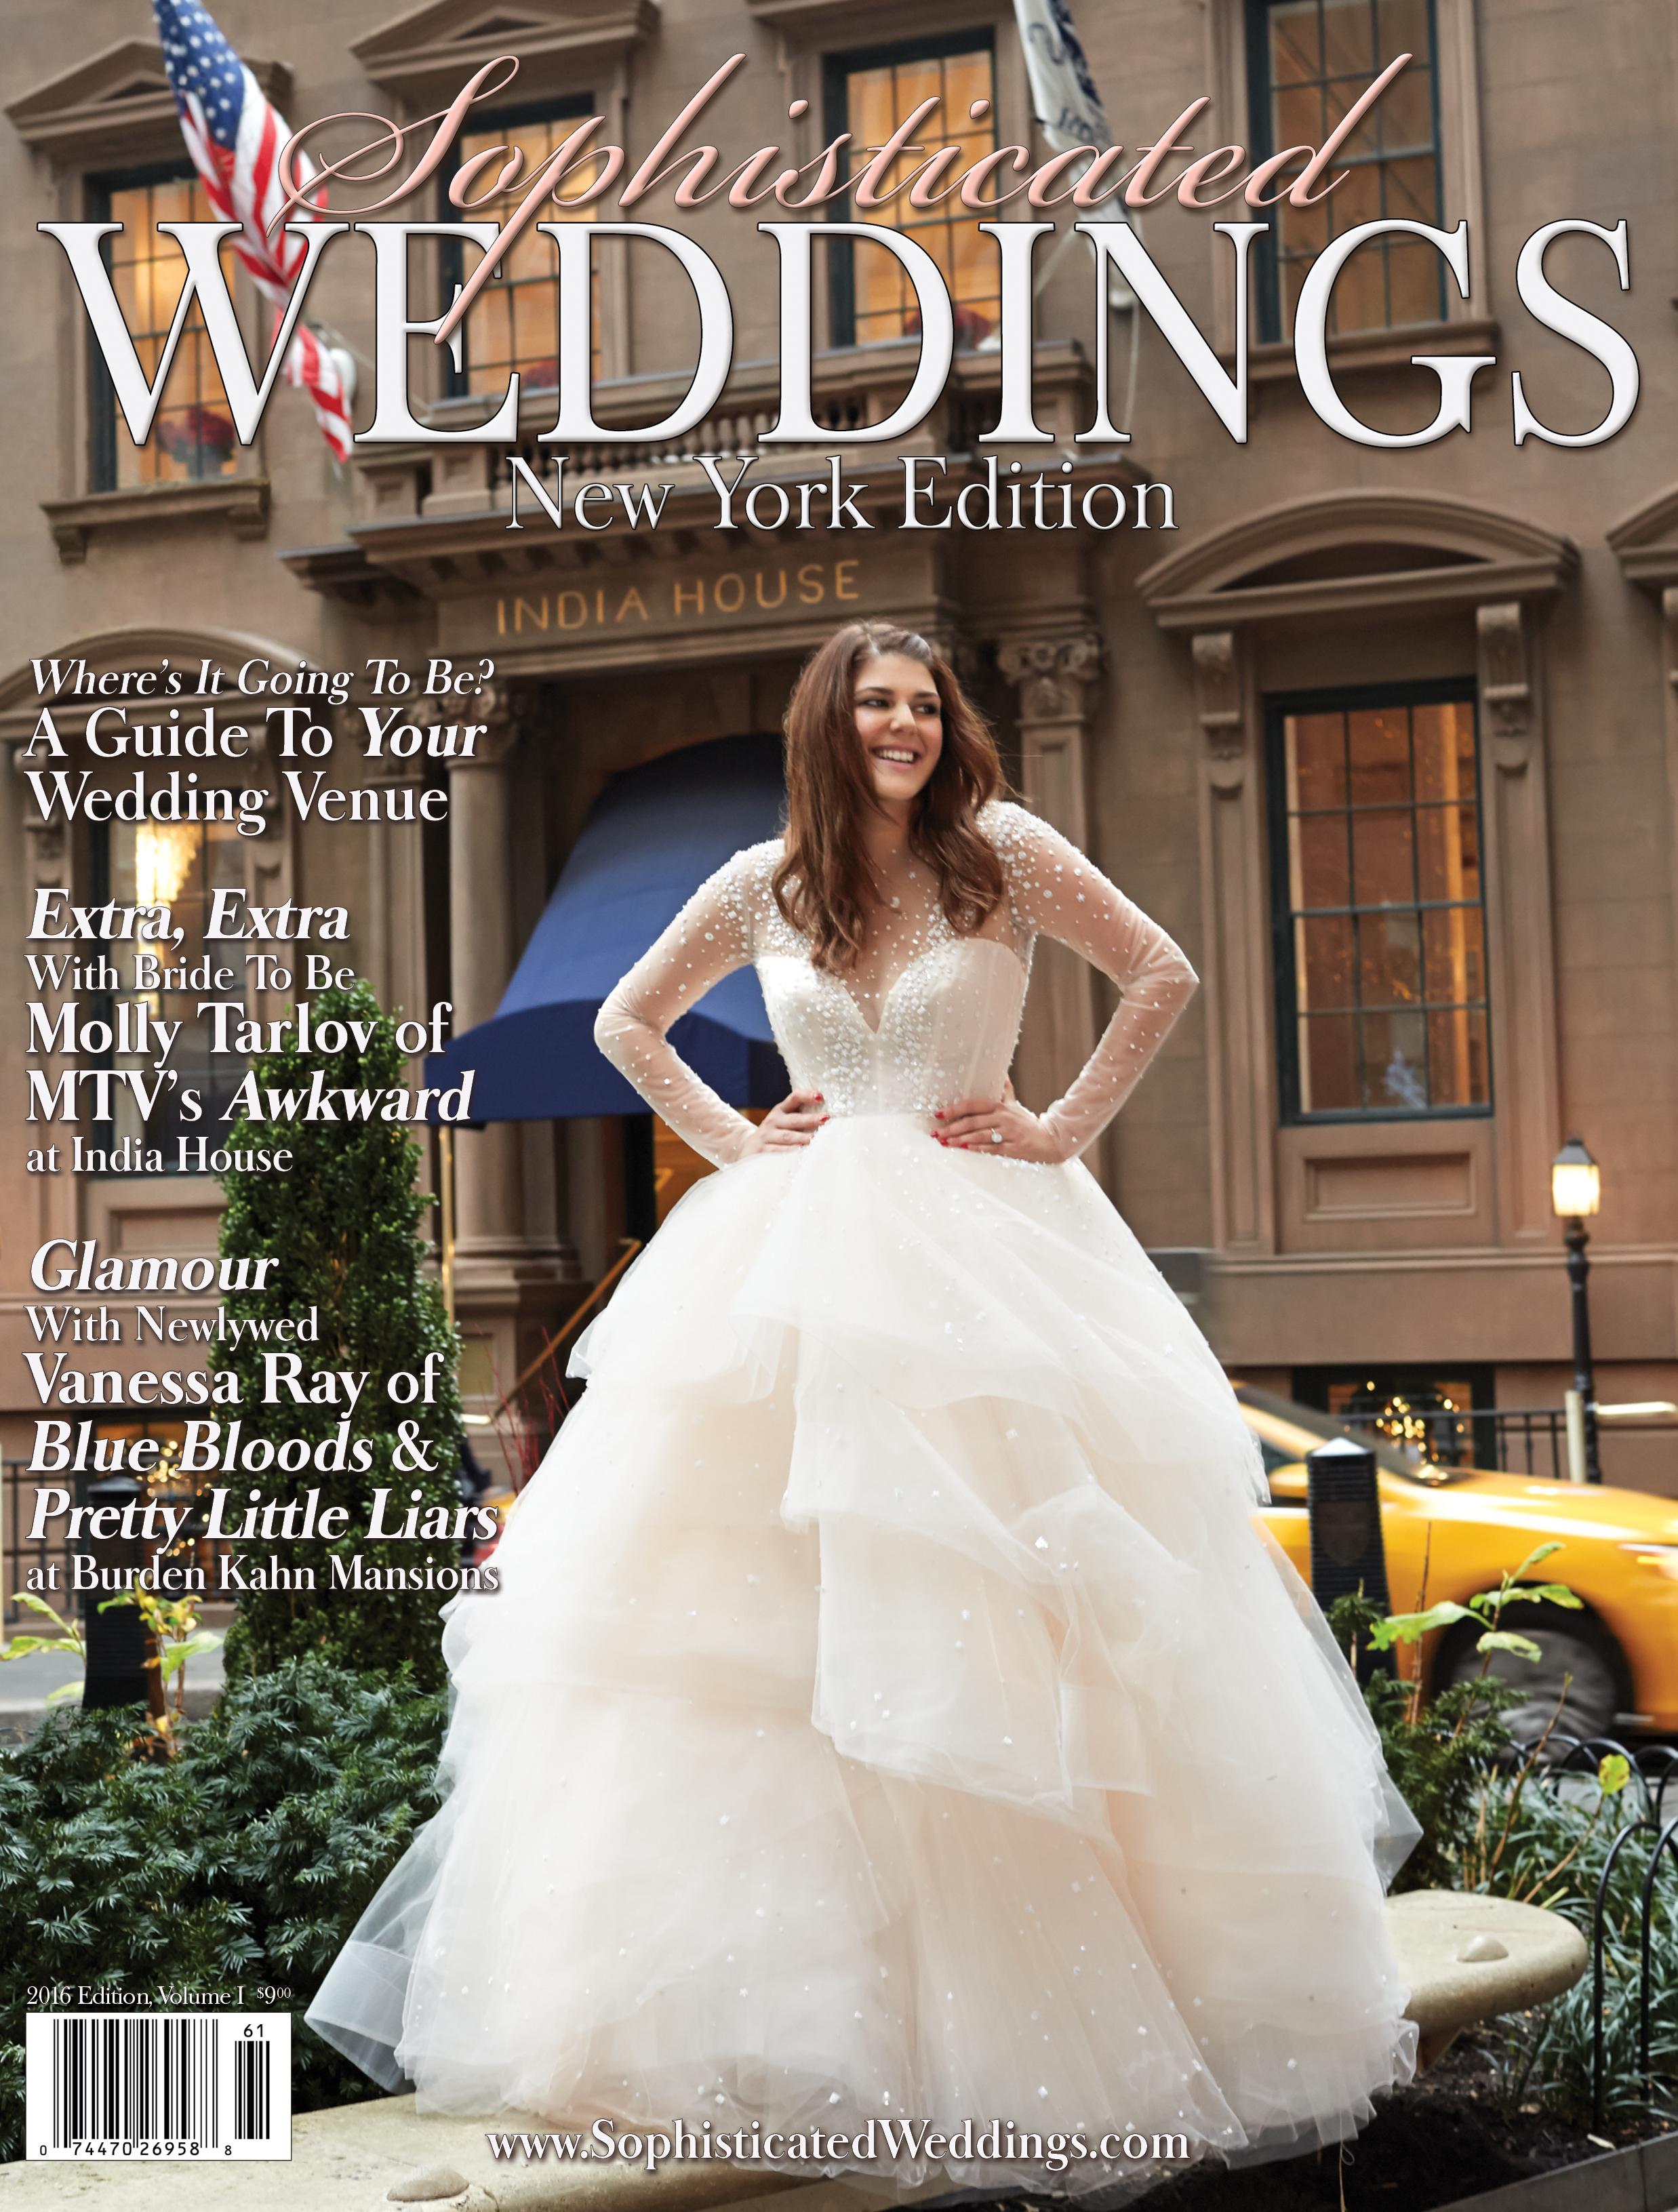 Sophisticated Weddings Molly Tarlov